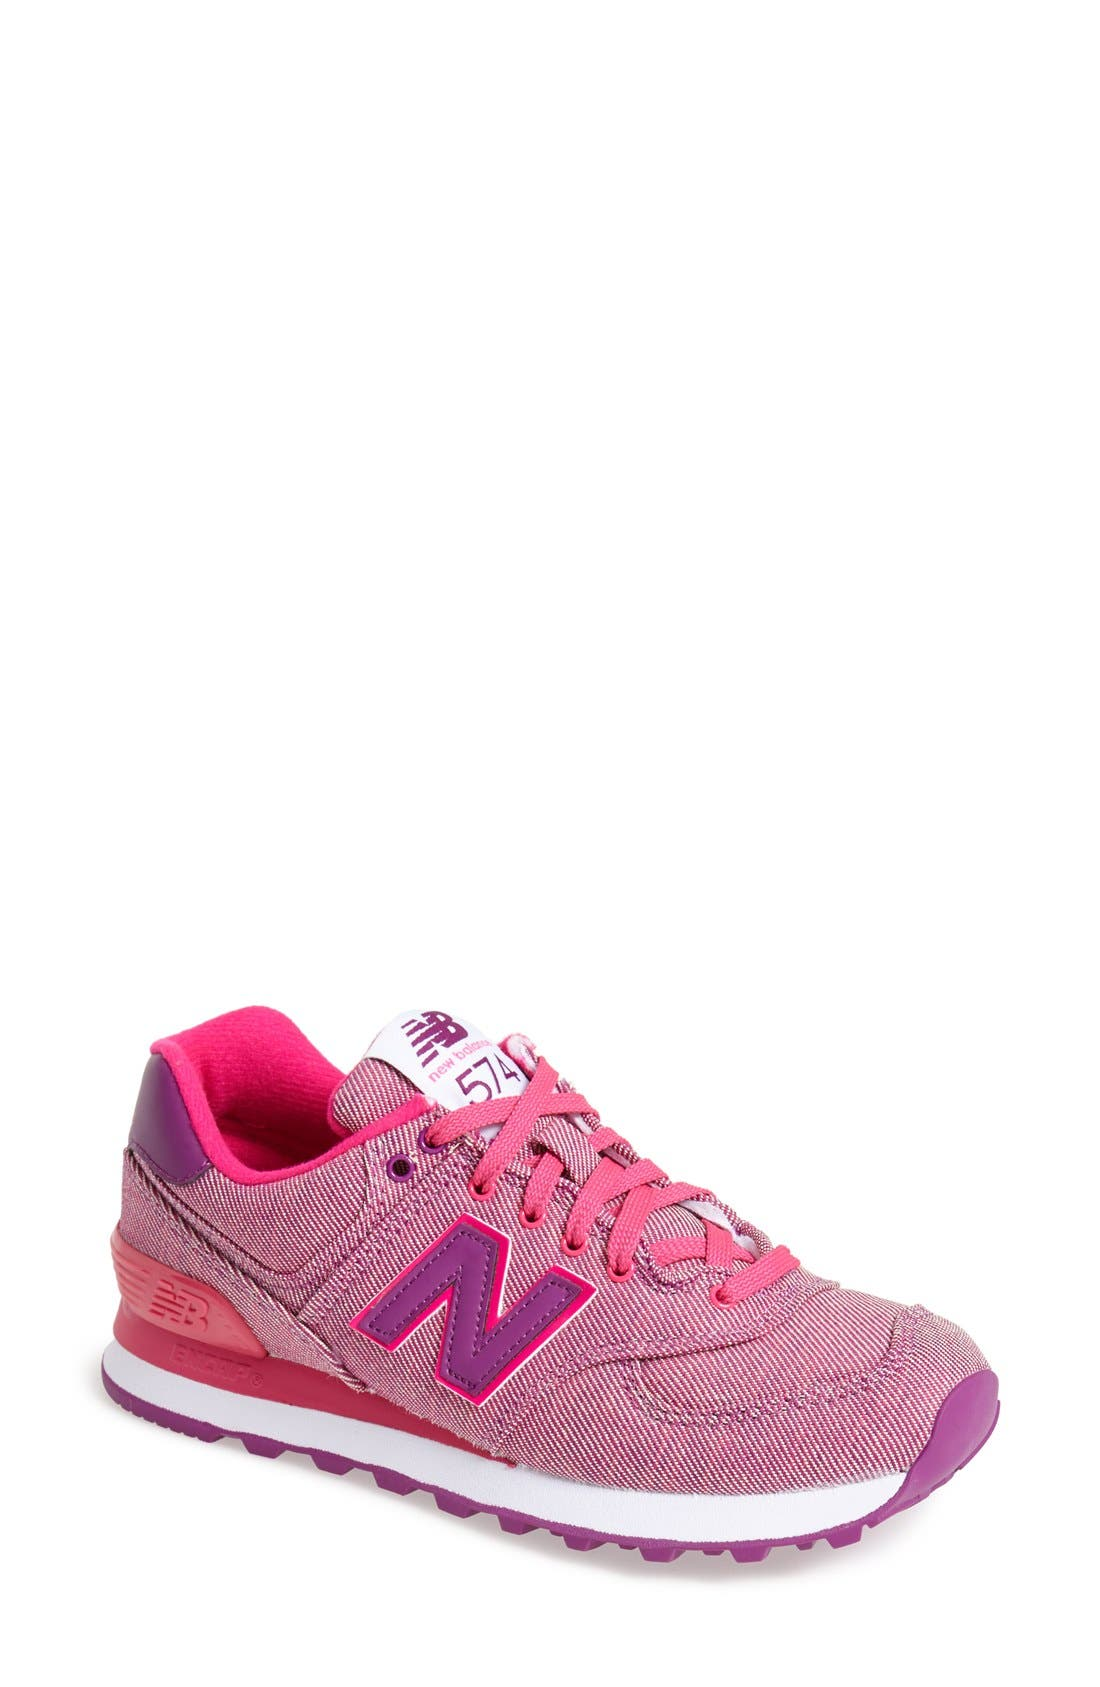 Alternate Image 1 Selected - New Balance '574 - Static' Sneaker (Women)